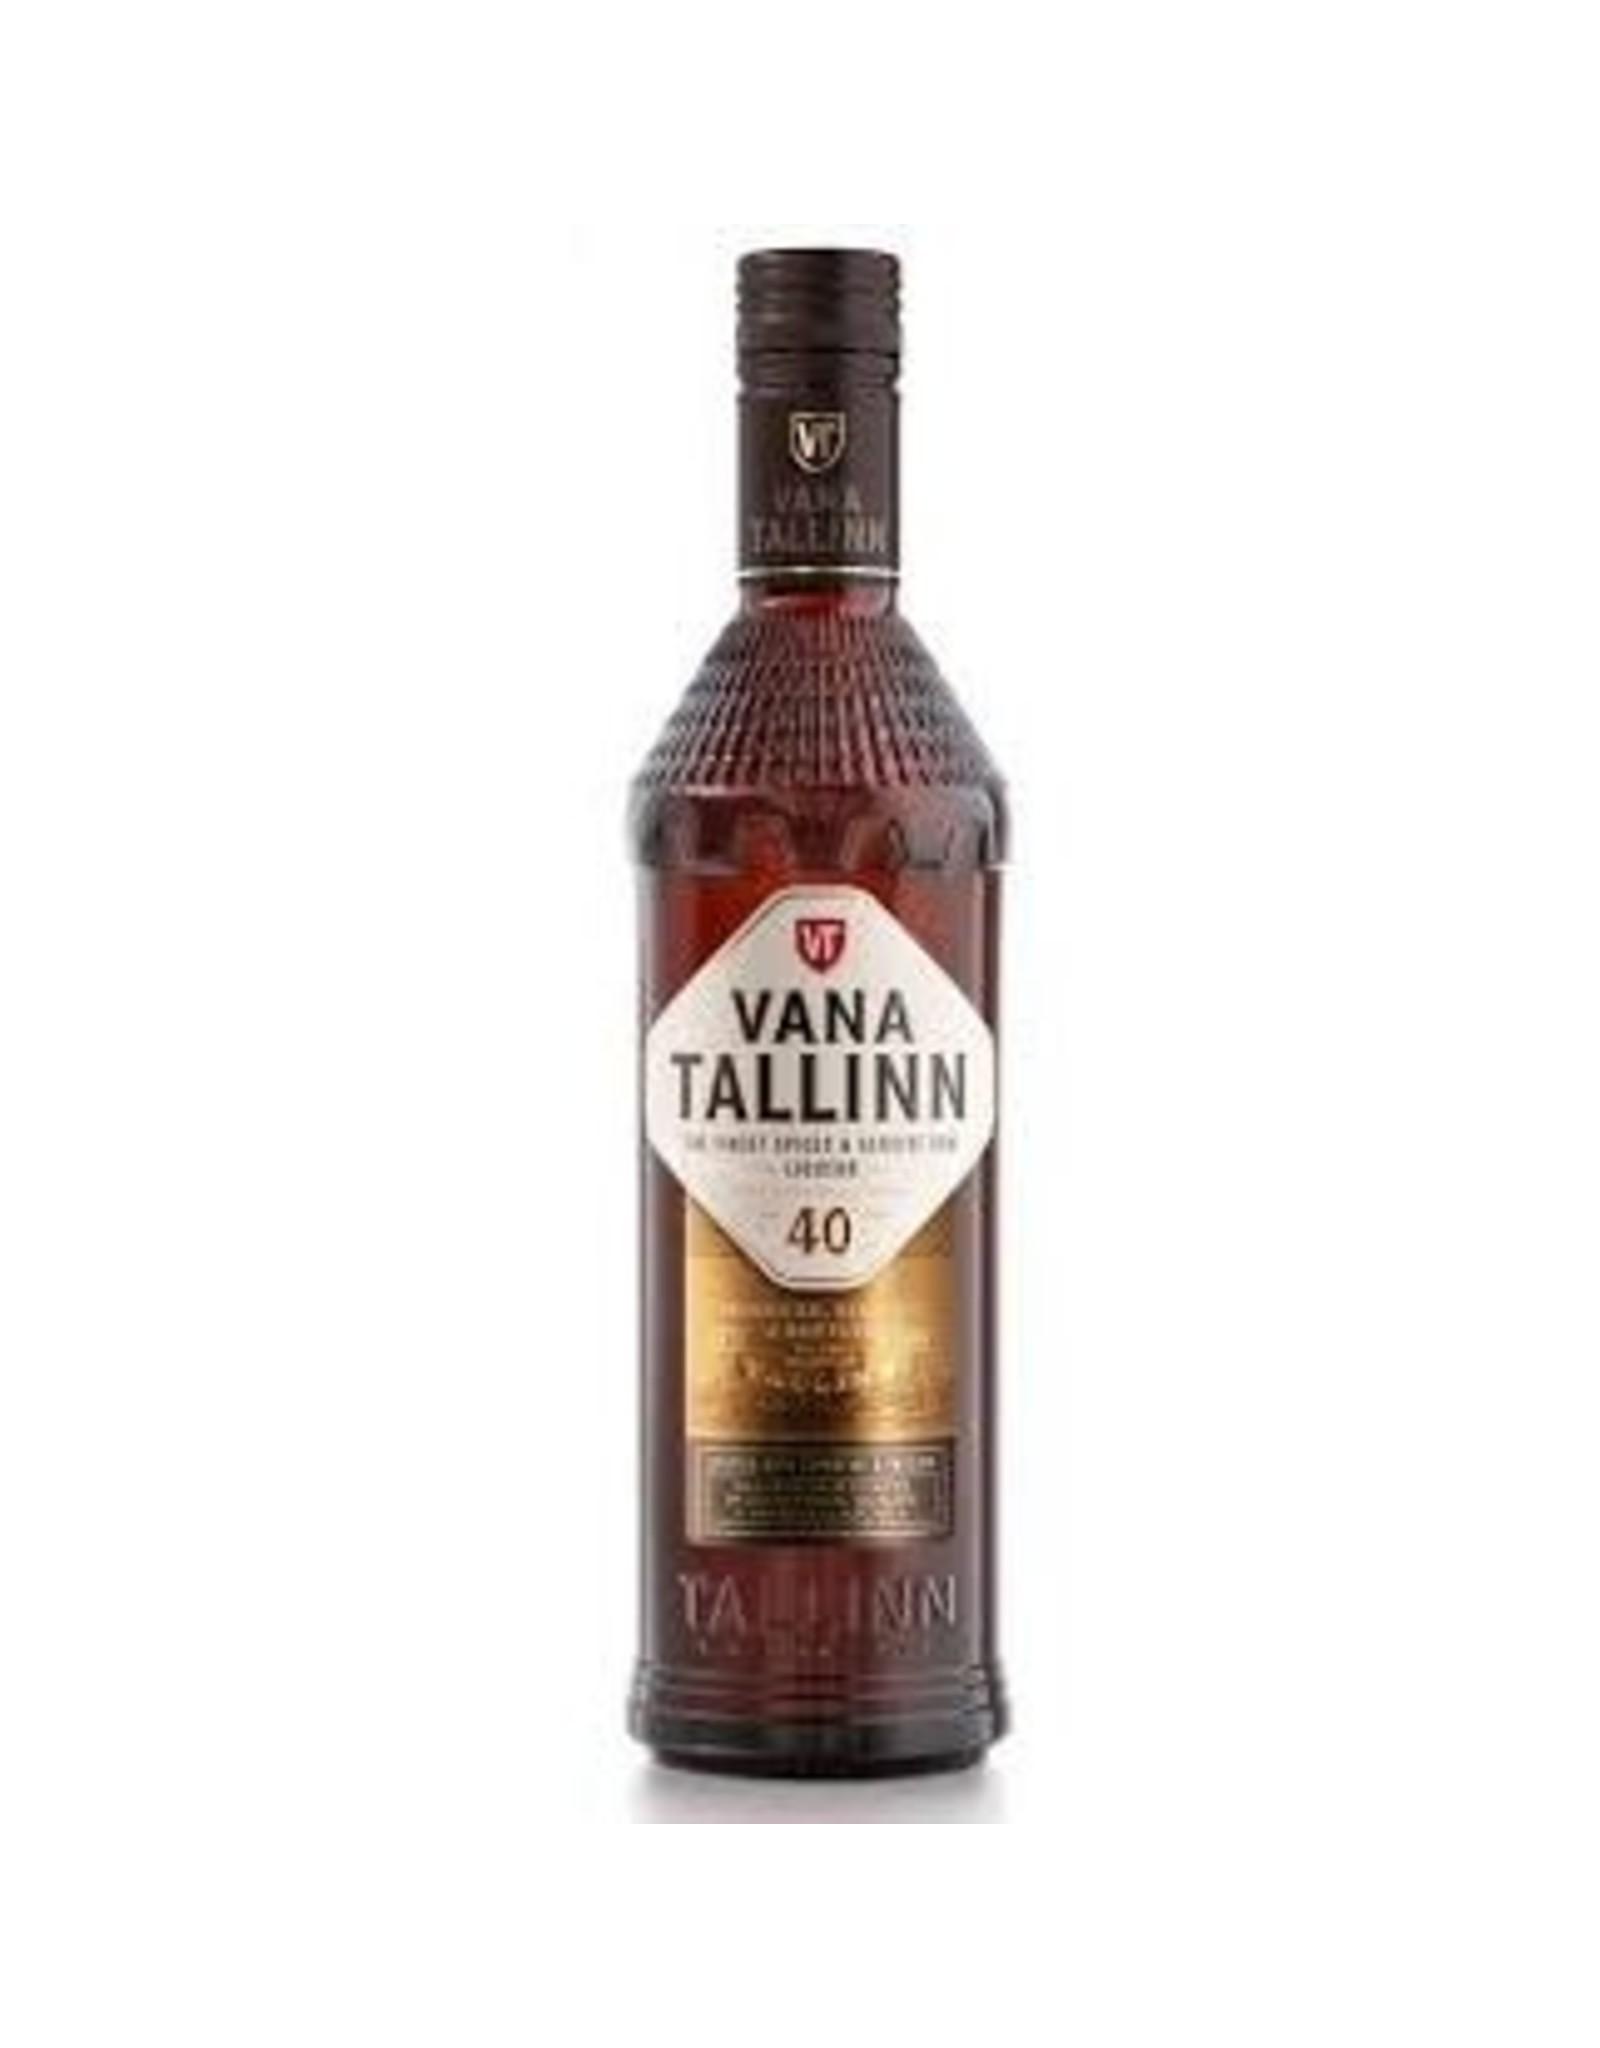 Vana Tallinn 50cl. 40%